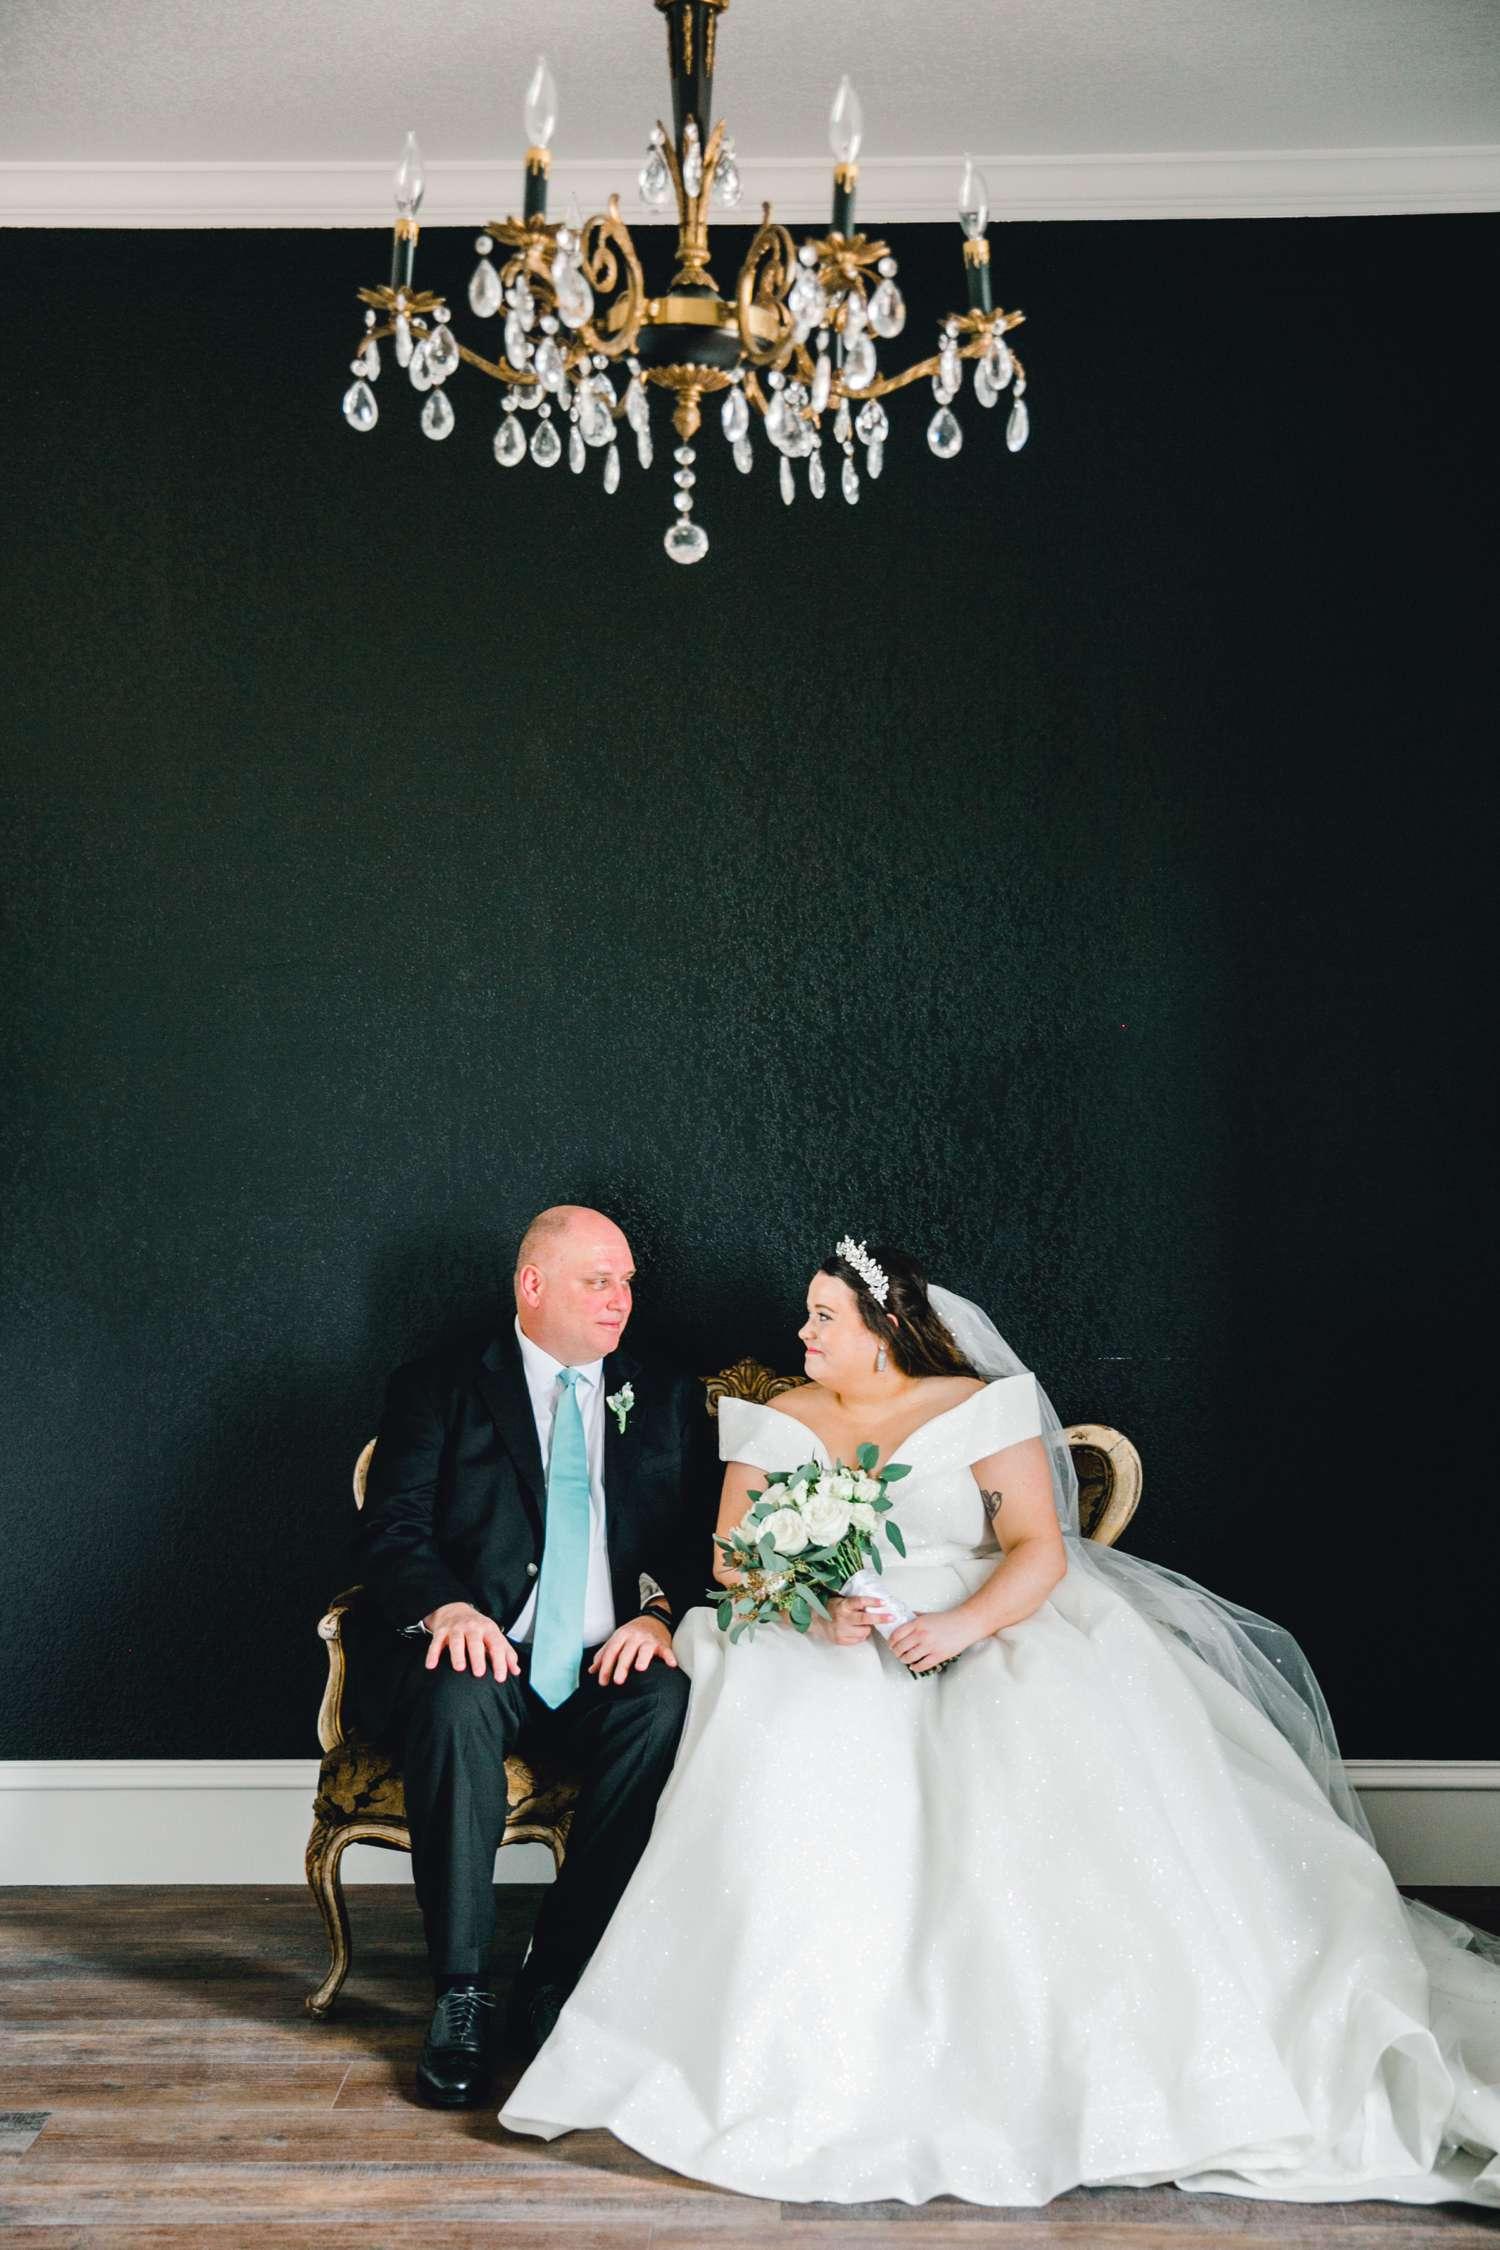 CASSIDY+AND+HARLEY+BRADLEY+EBERLEY+BROOKS+CHAPEL+LUBBOCK+WEDDING+PHOTOGRAPHER+ALLEEJ_0059.jpg